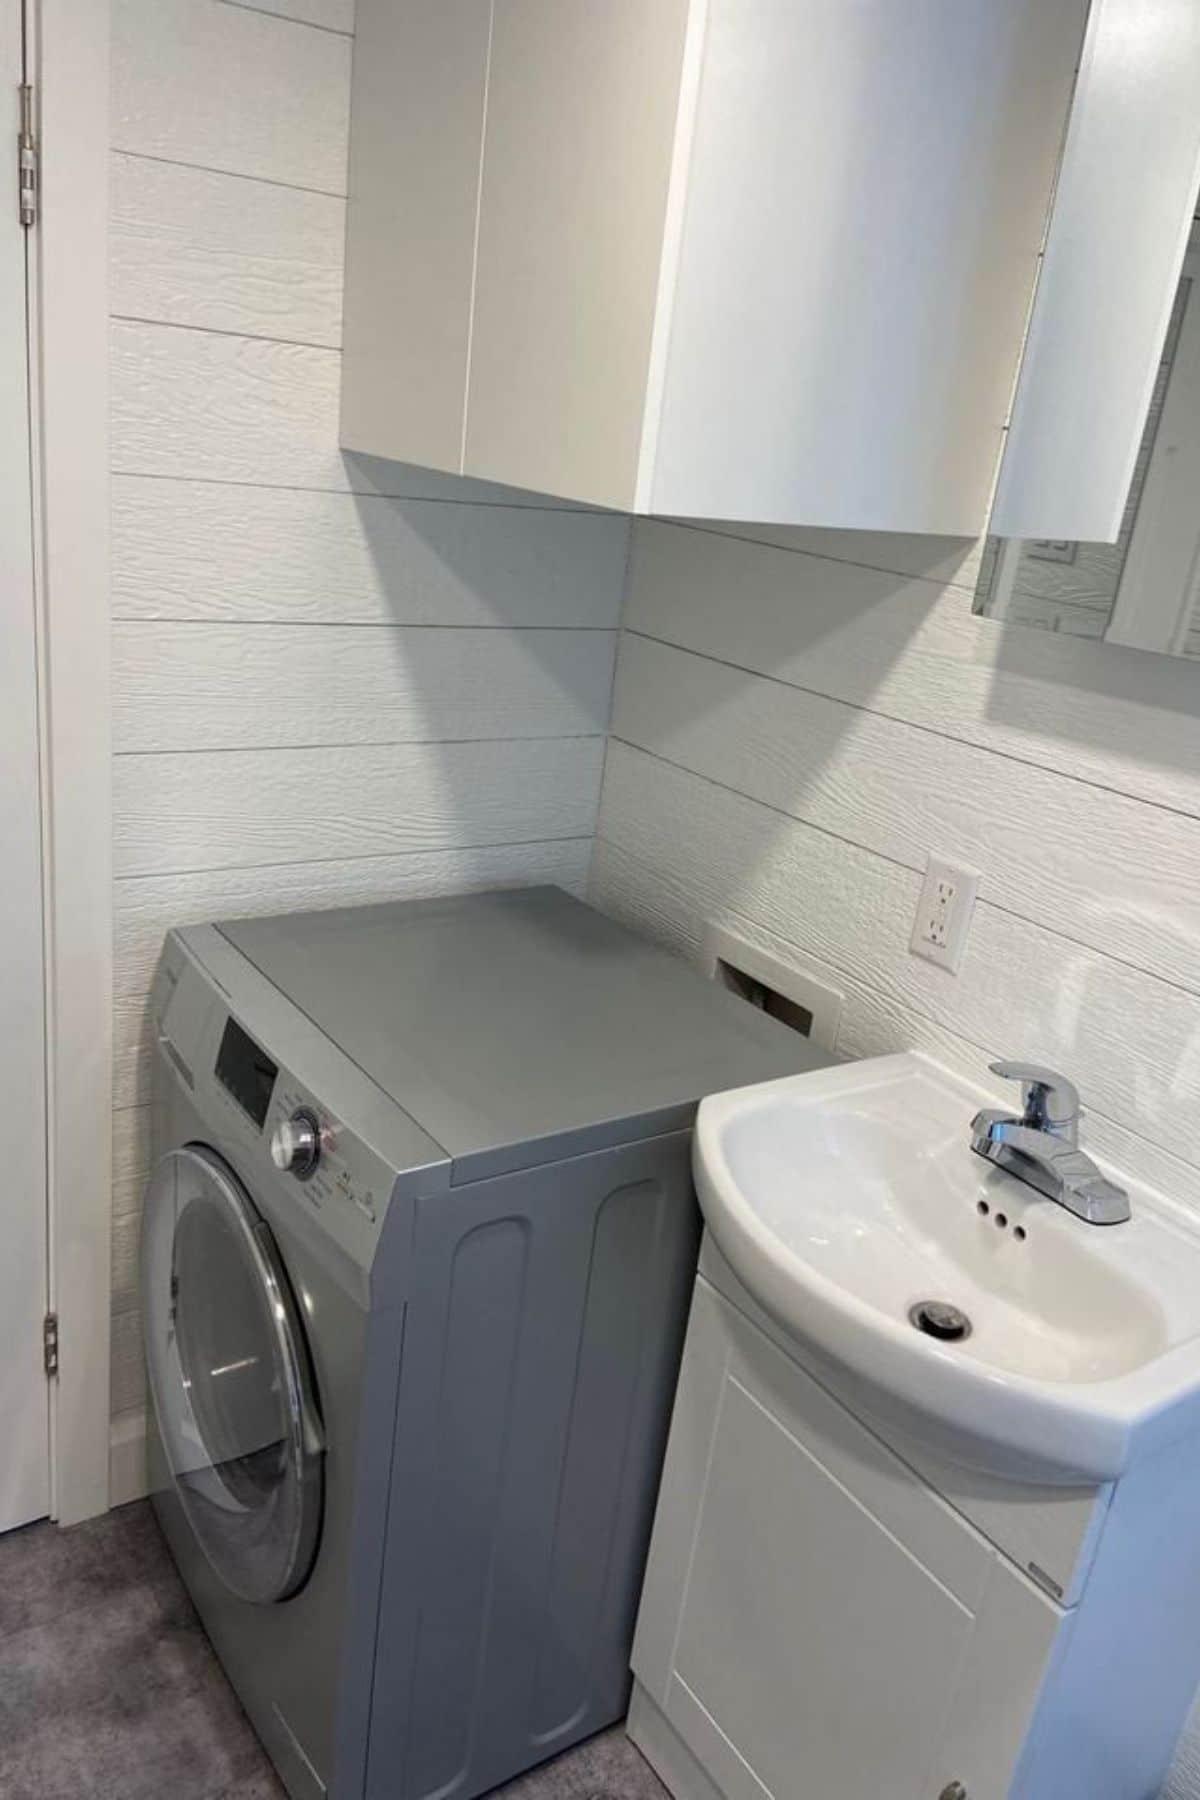 Gray washing machine next to white sink